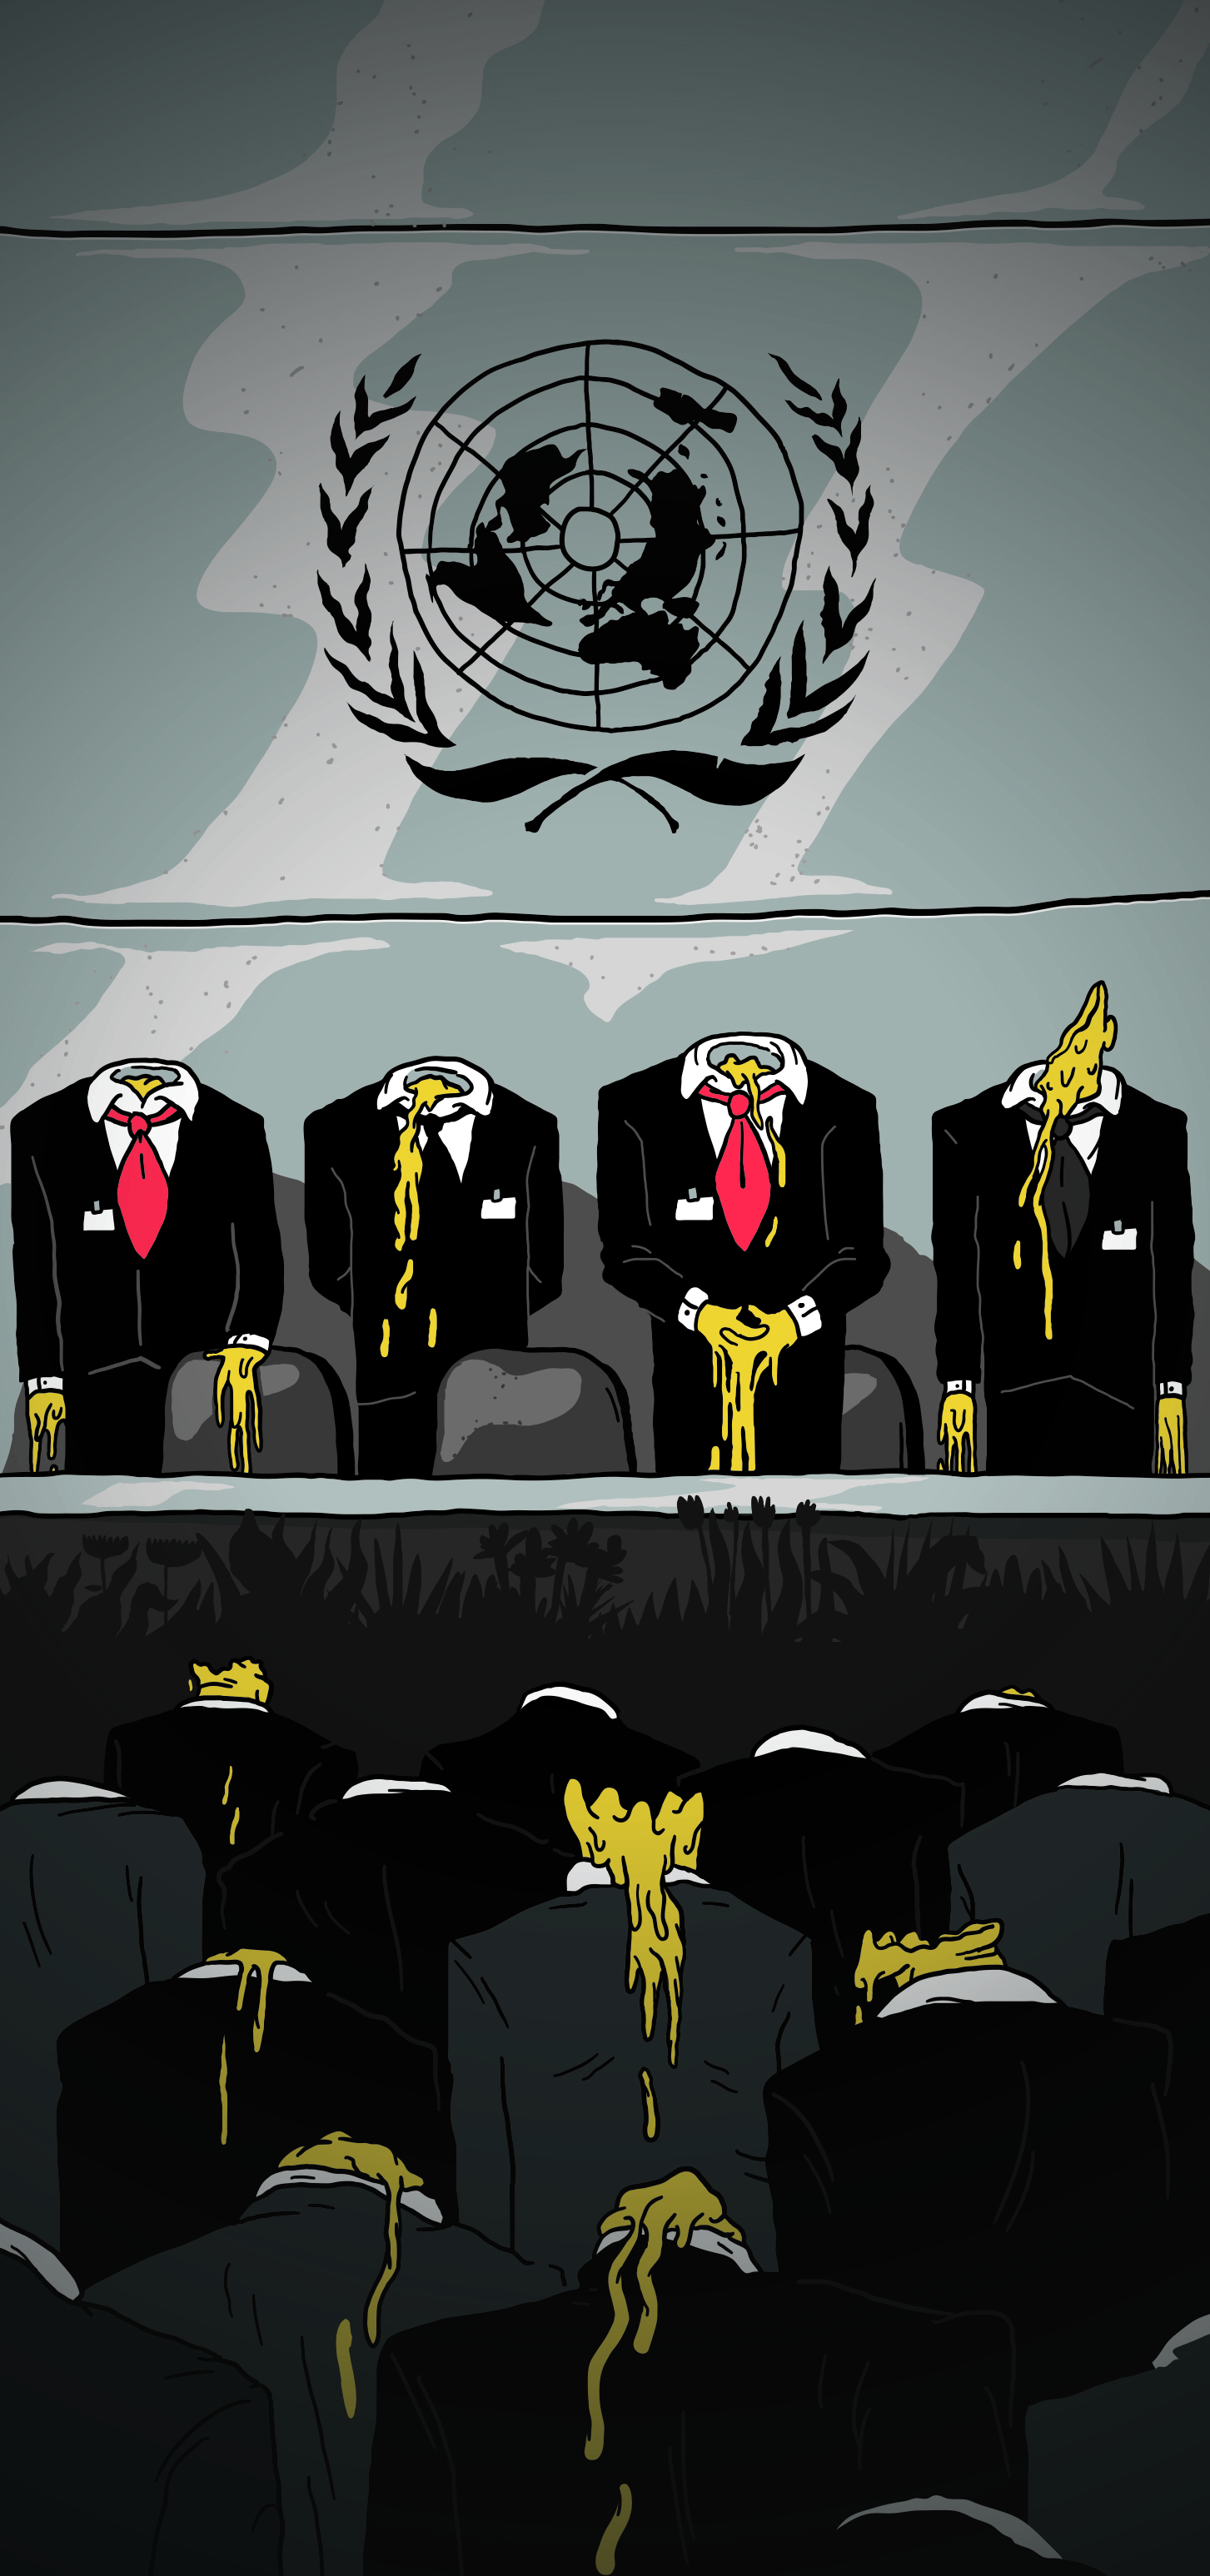 Le Monde Diplomatique Editorial illustration Linnch